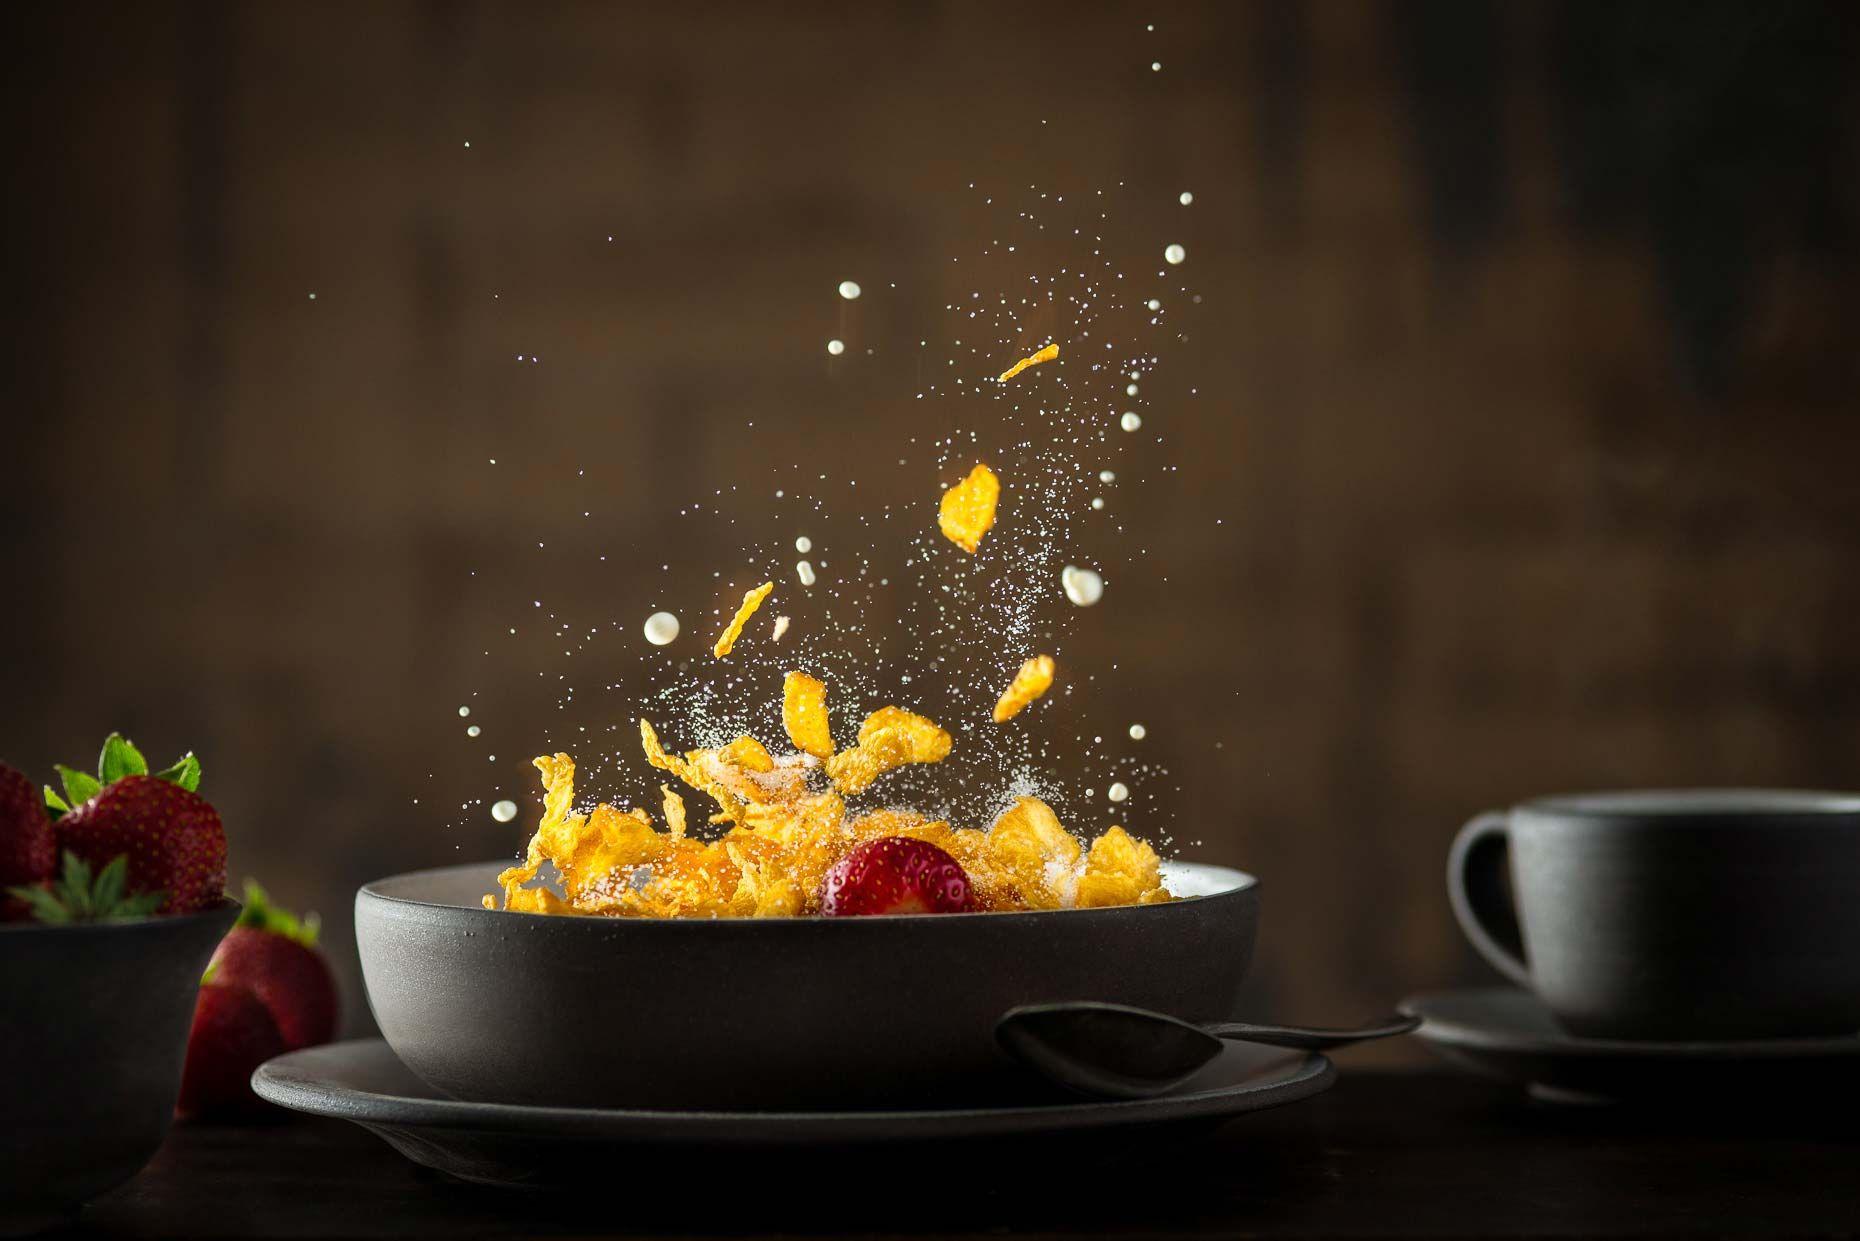 Francesco tonelli photography 1 1 photographing food